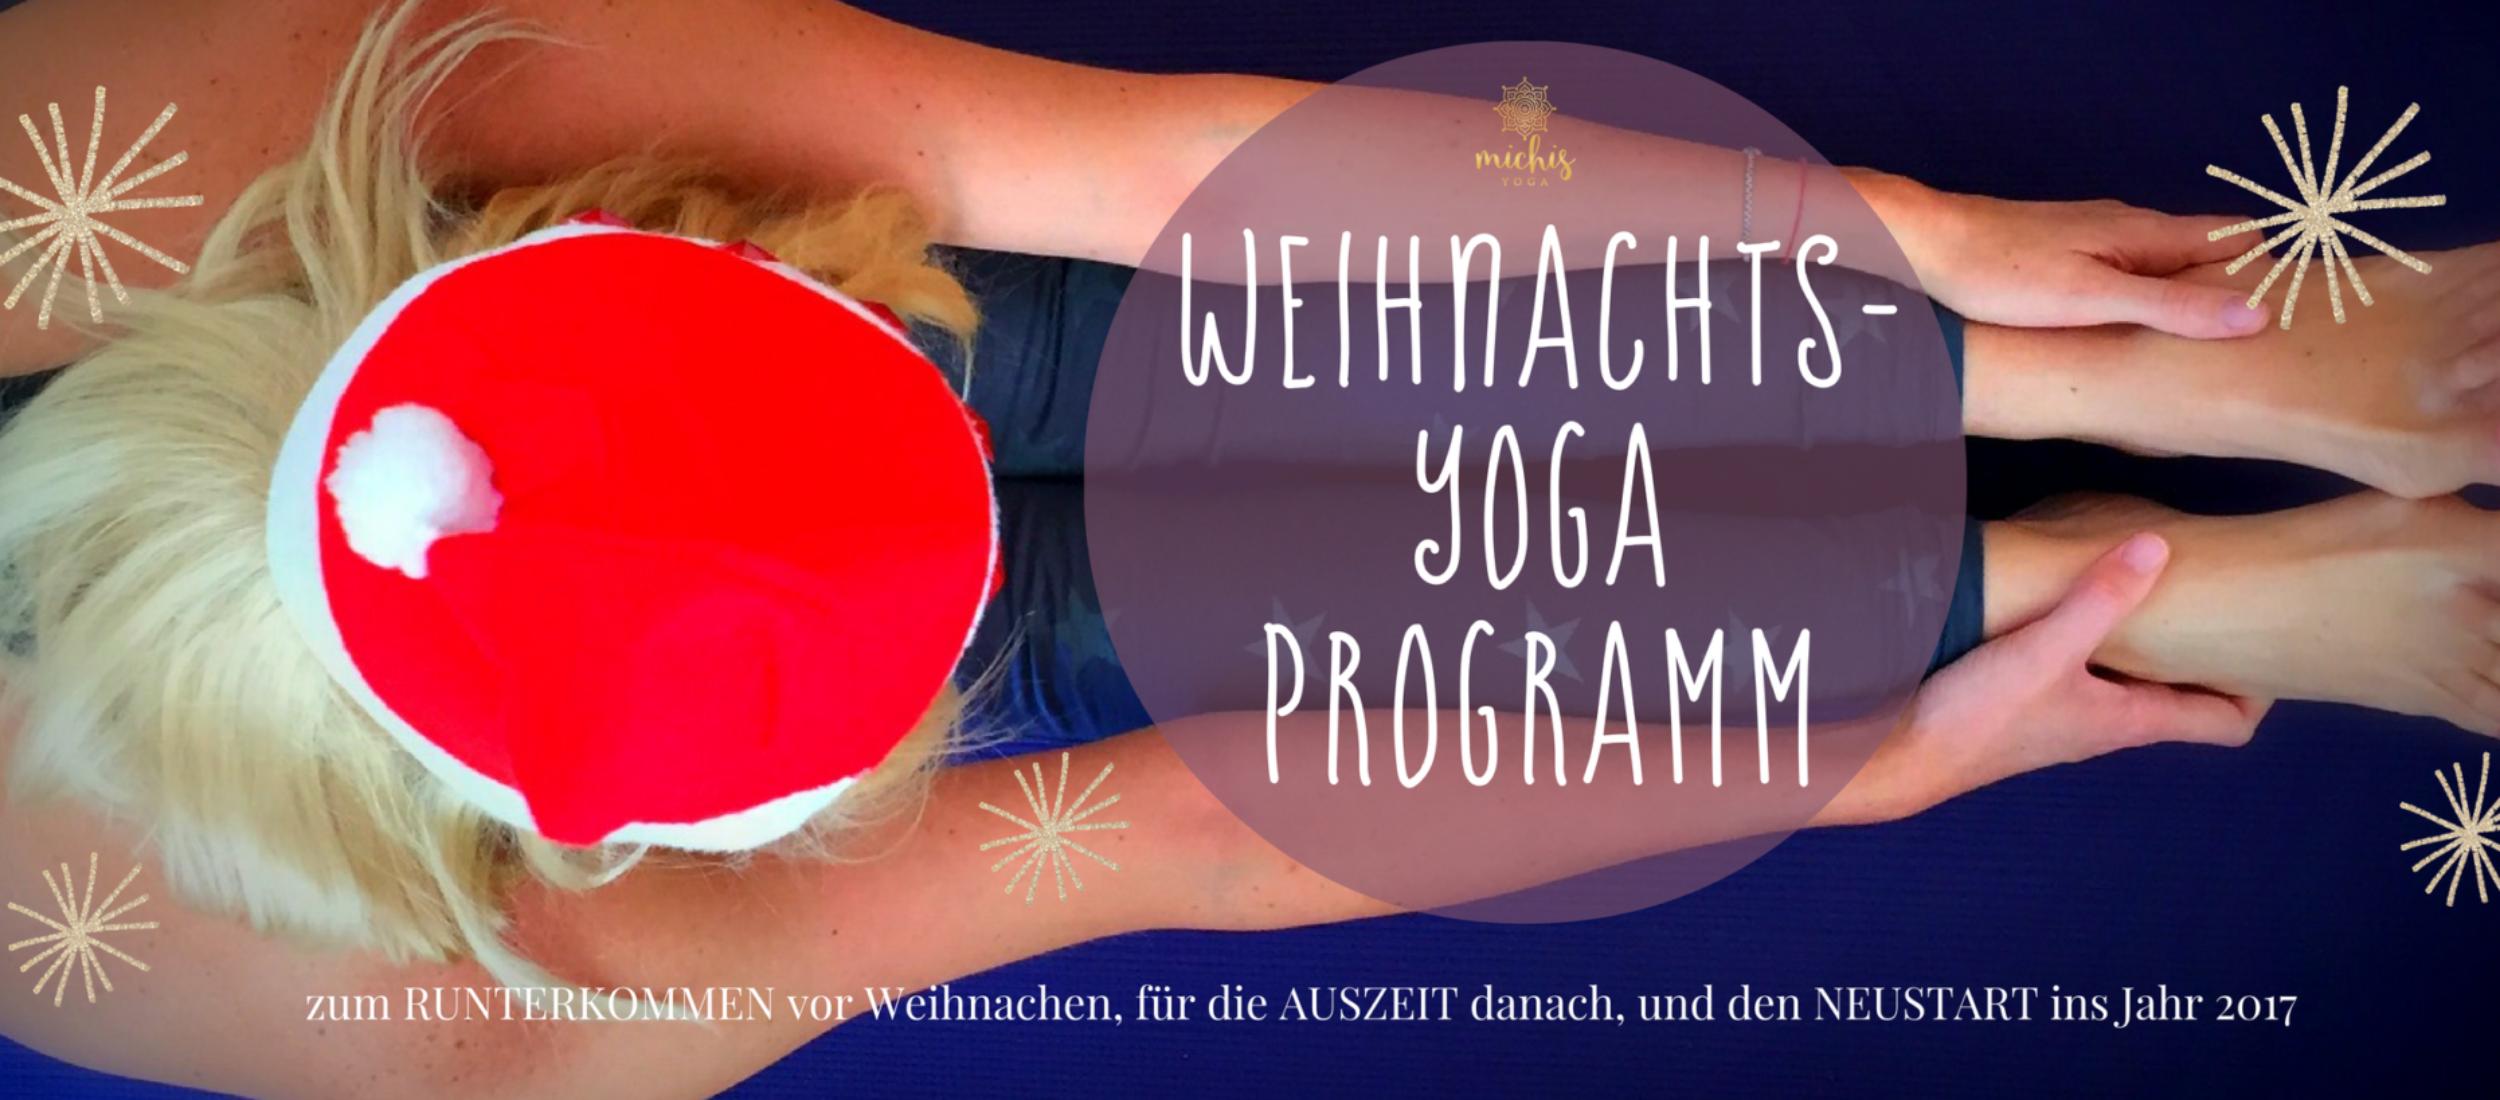 copy-of-weihnachts-yoga-header